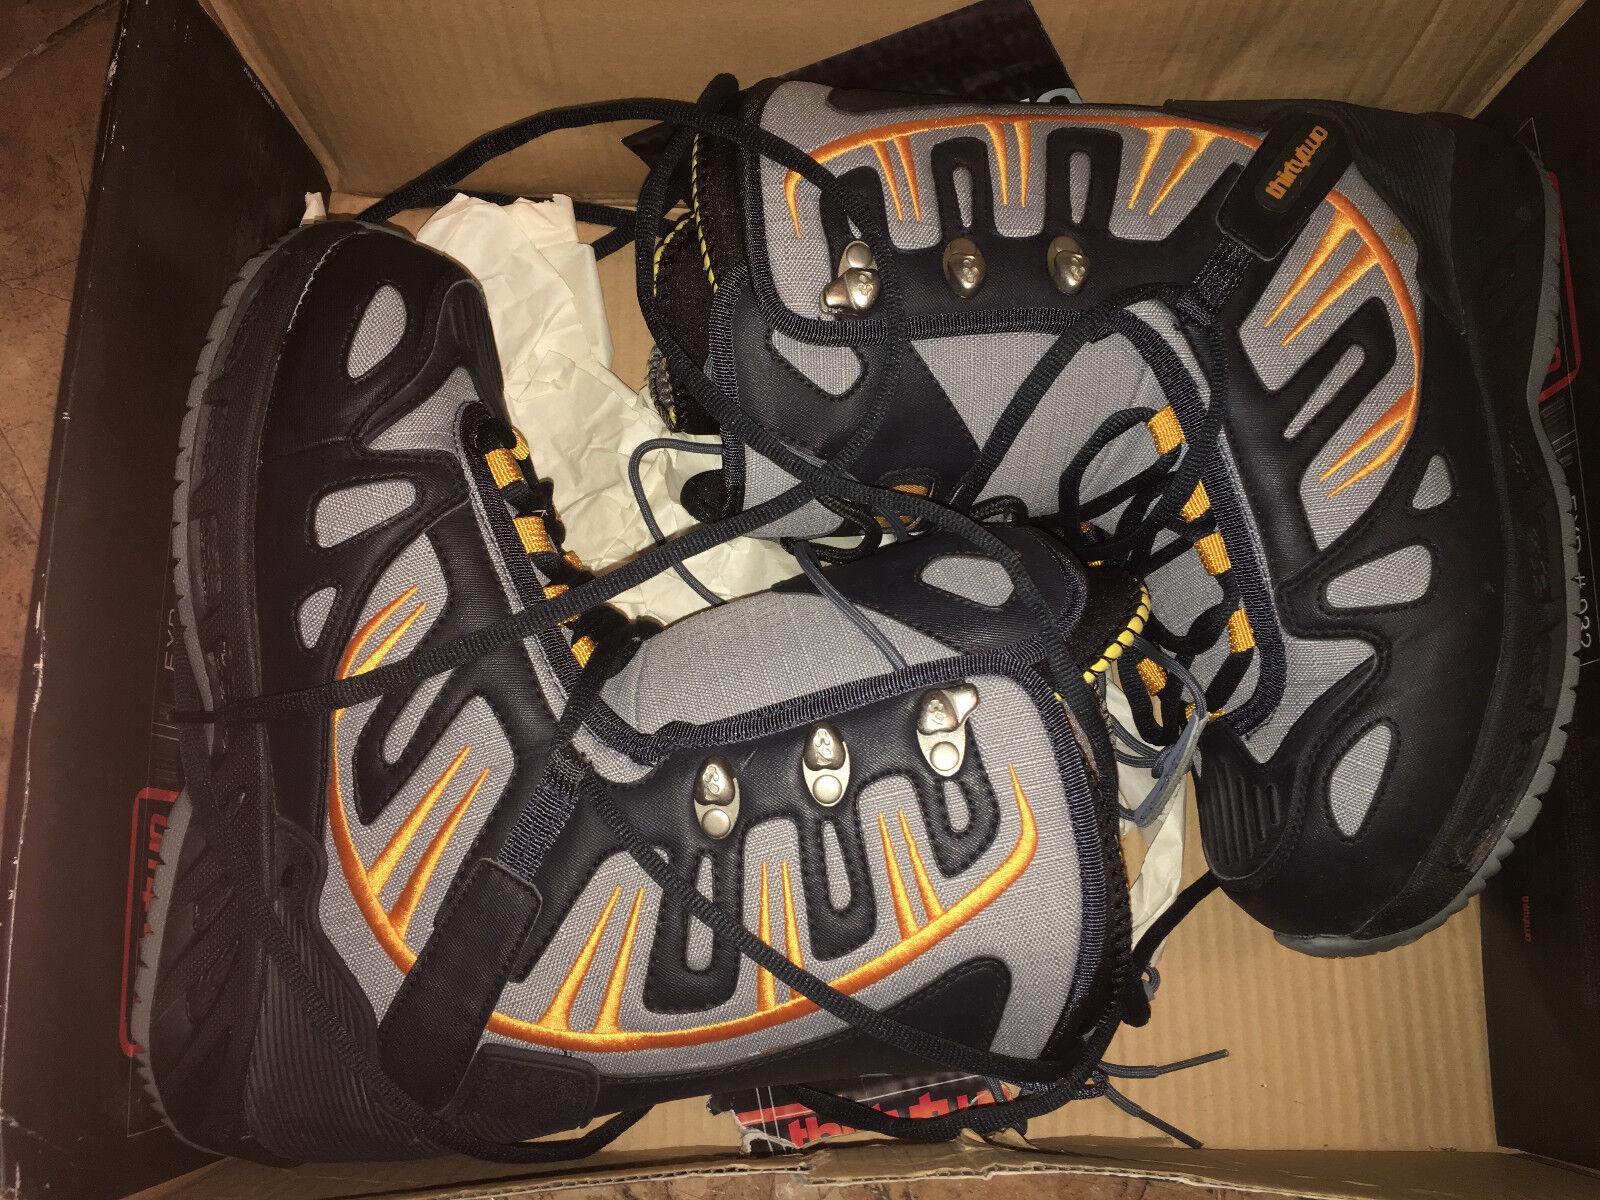 MEN'S THIRTY TWO ADVANCED SNOWBOARD FOOTWEAR PRION NAVY GREY orange SIZE 9